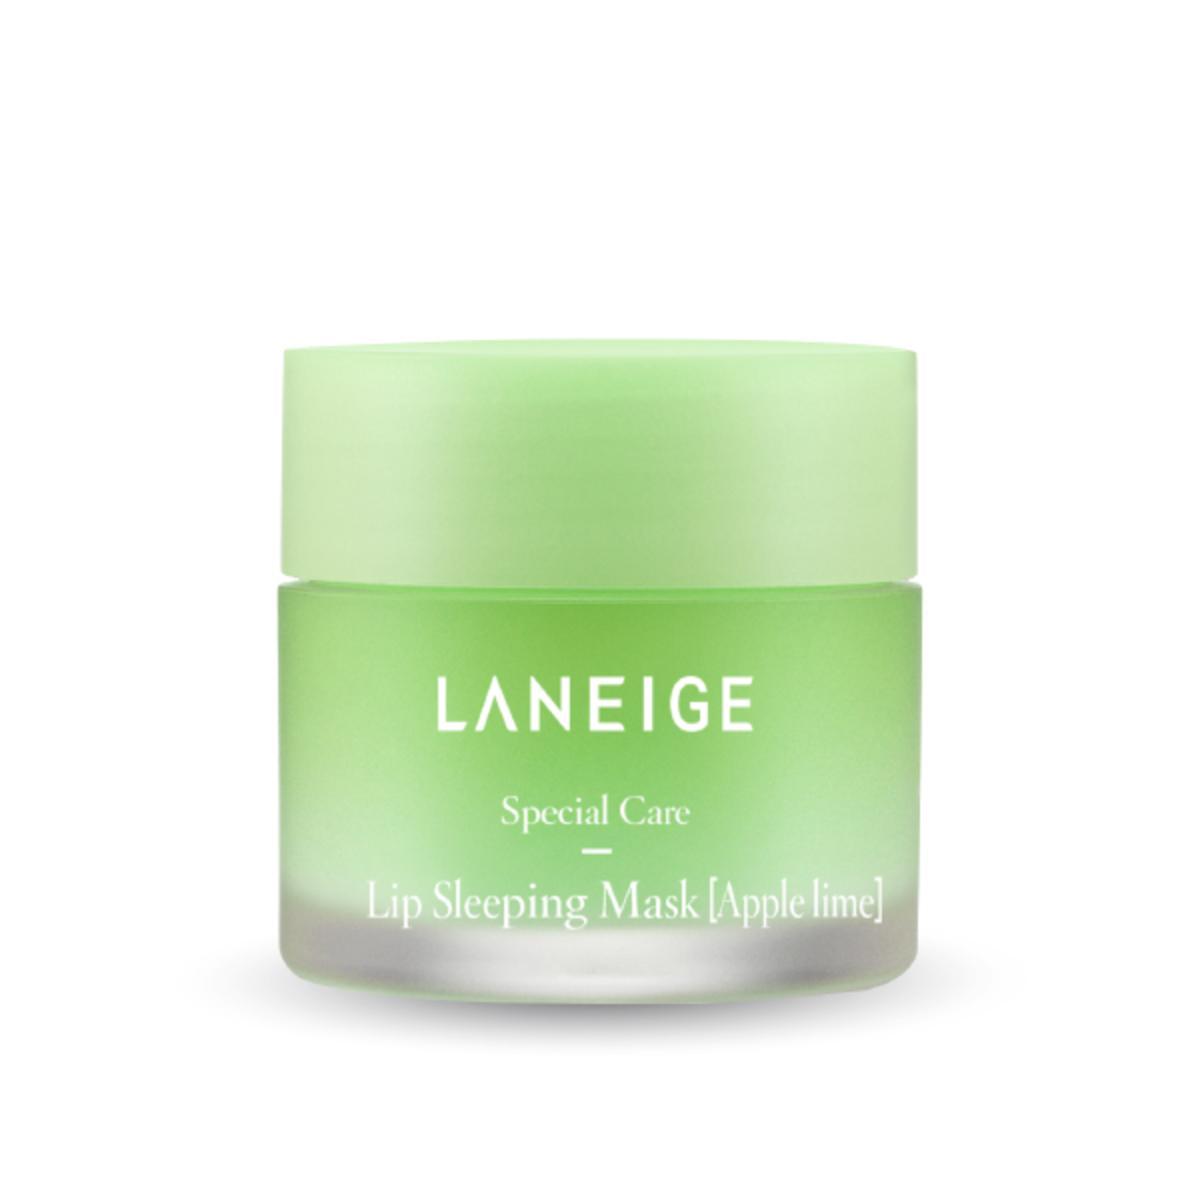 Laneige Sleeping Mask Kit Price In Singapore Lip Travel Size Apple Lime 20g W Box